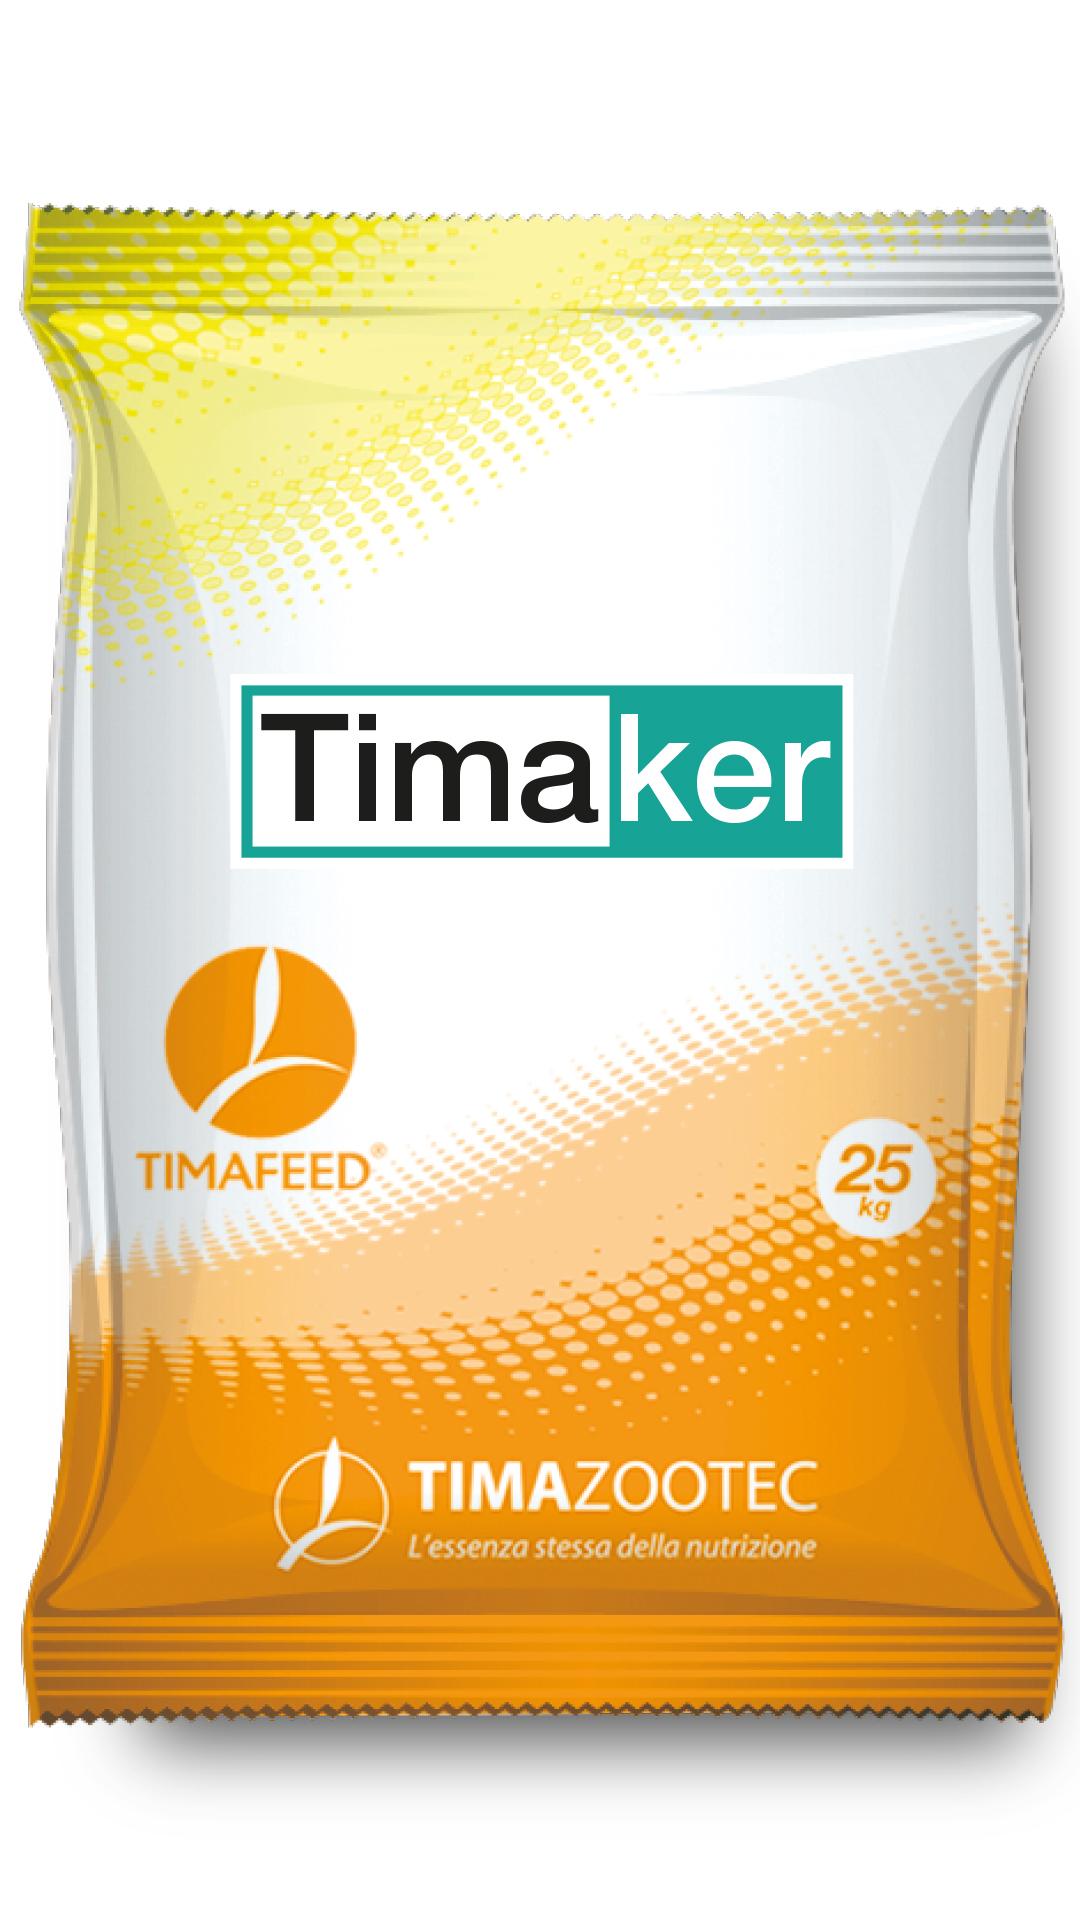 TIMAKER